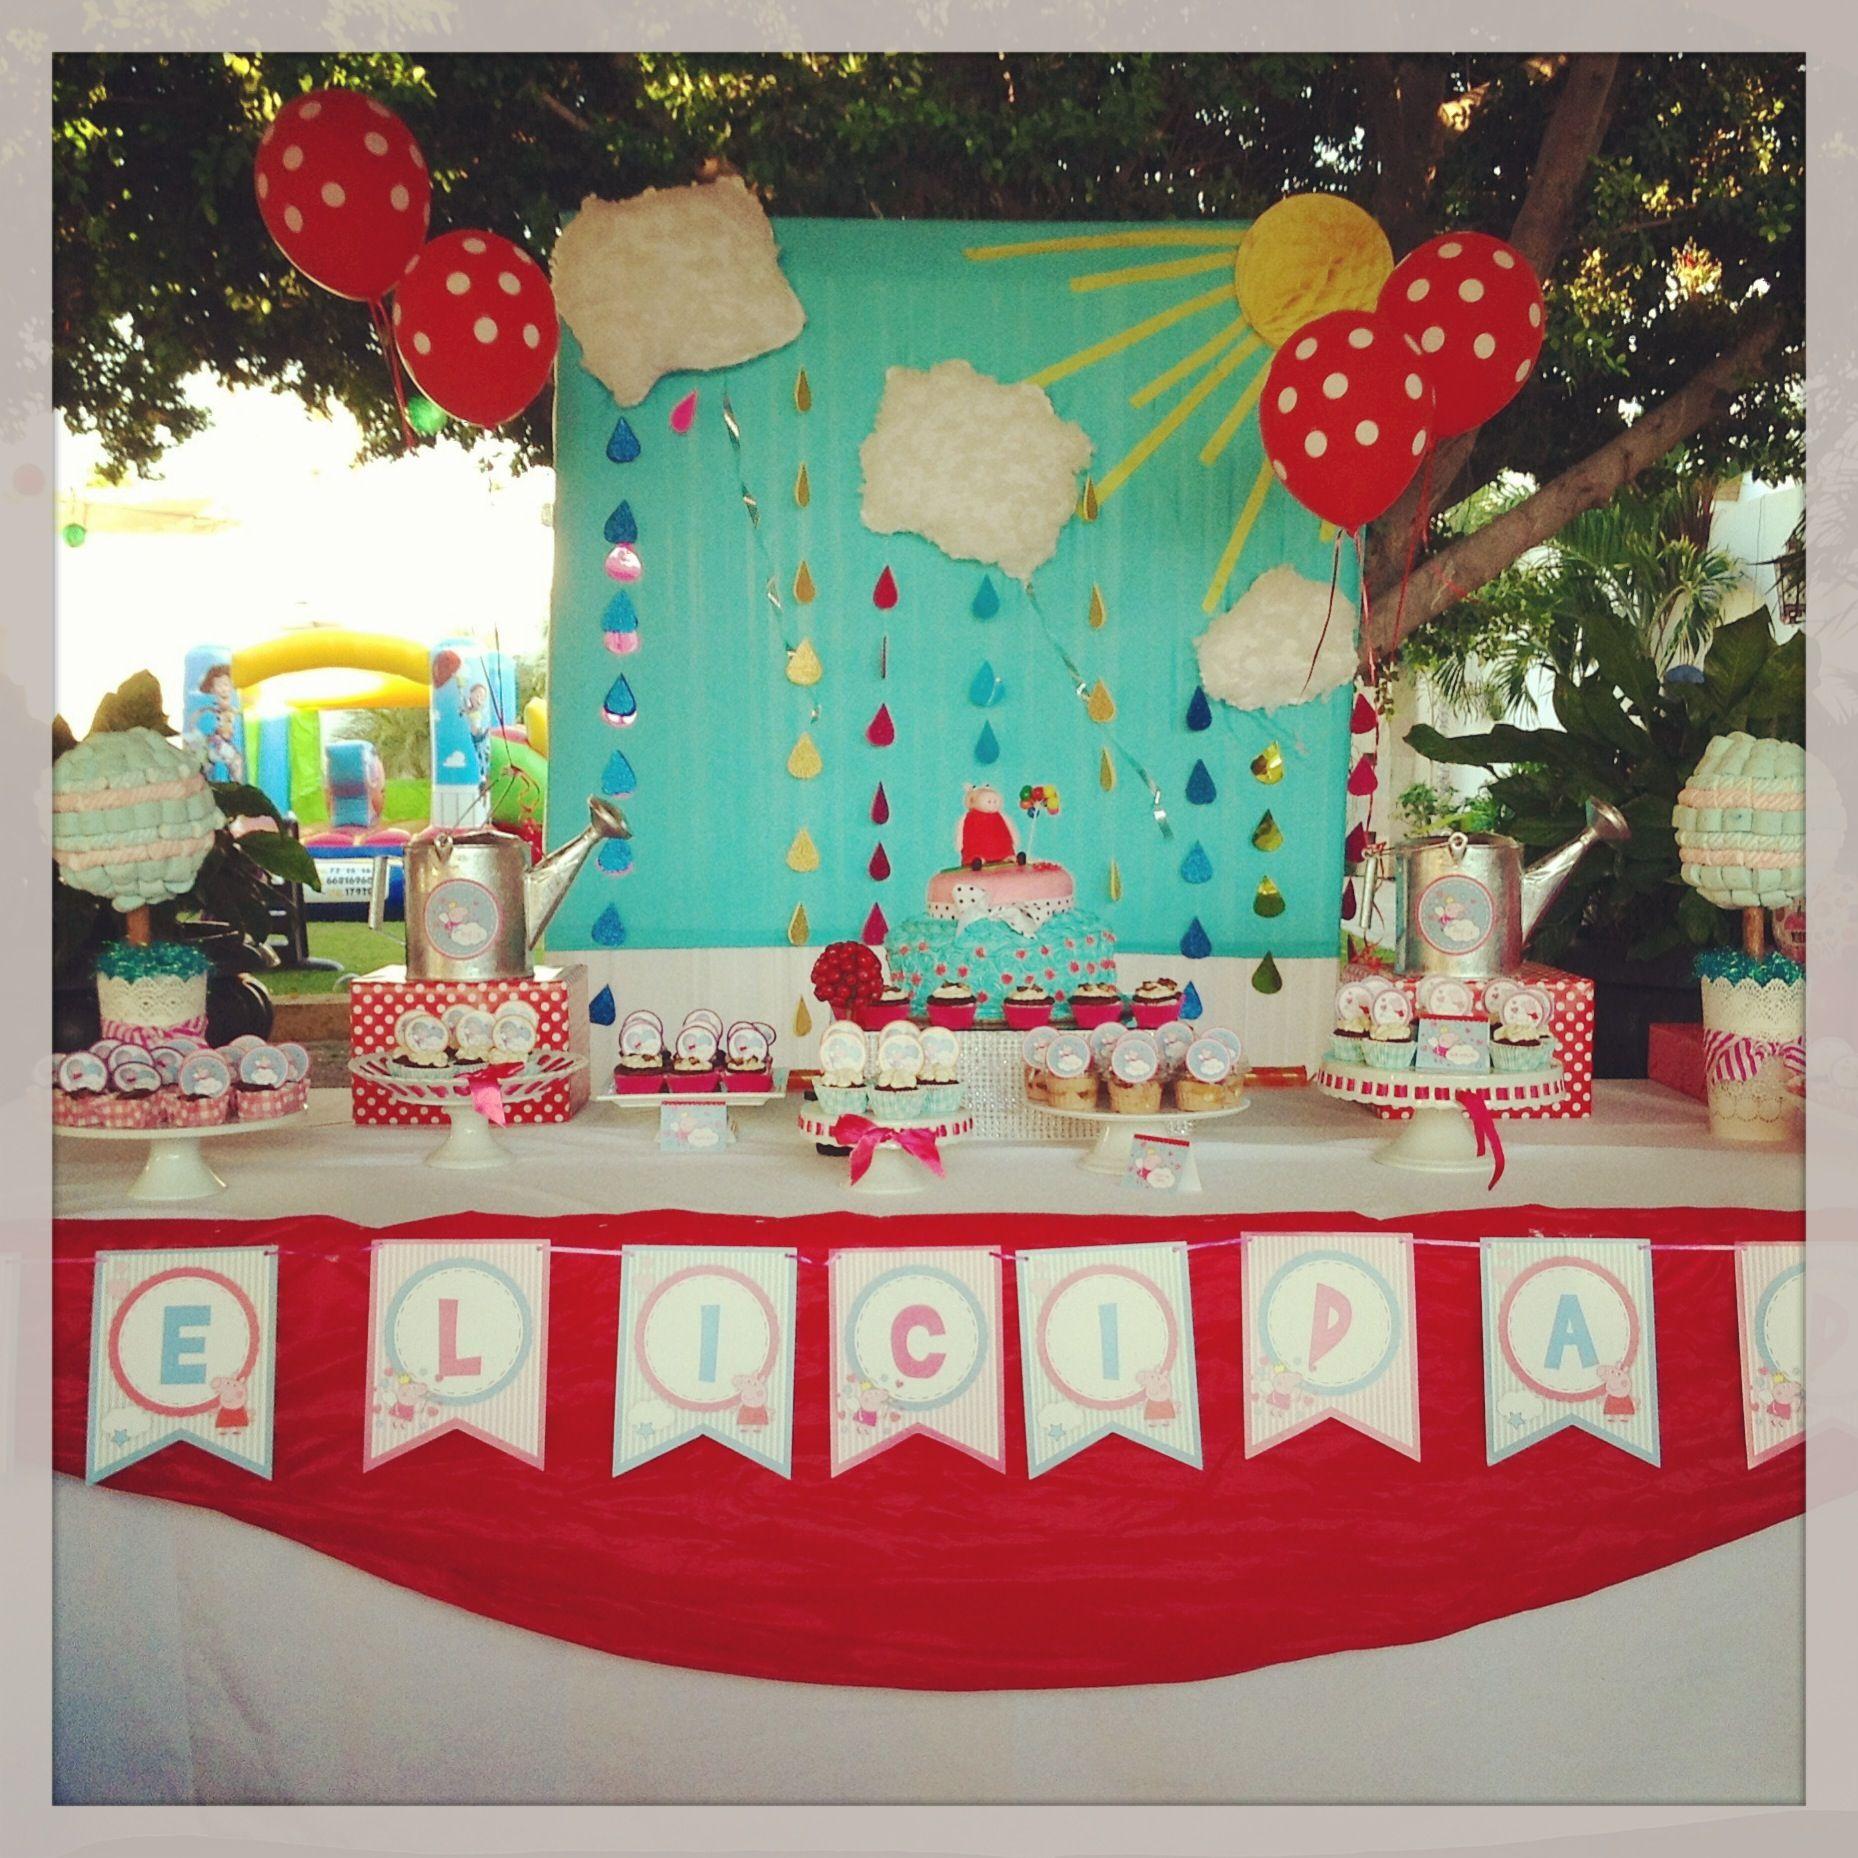 Peppa pig party cake table Cumple 3 Sofia Pinterest ...